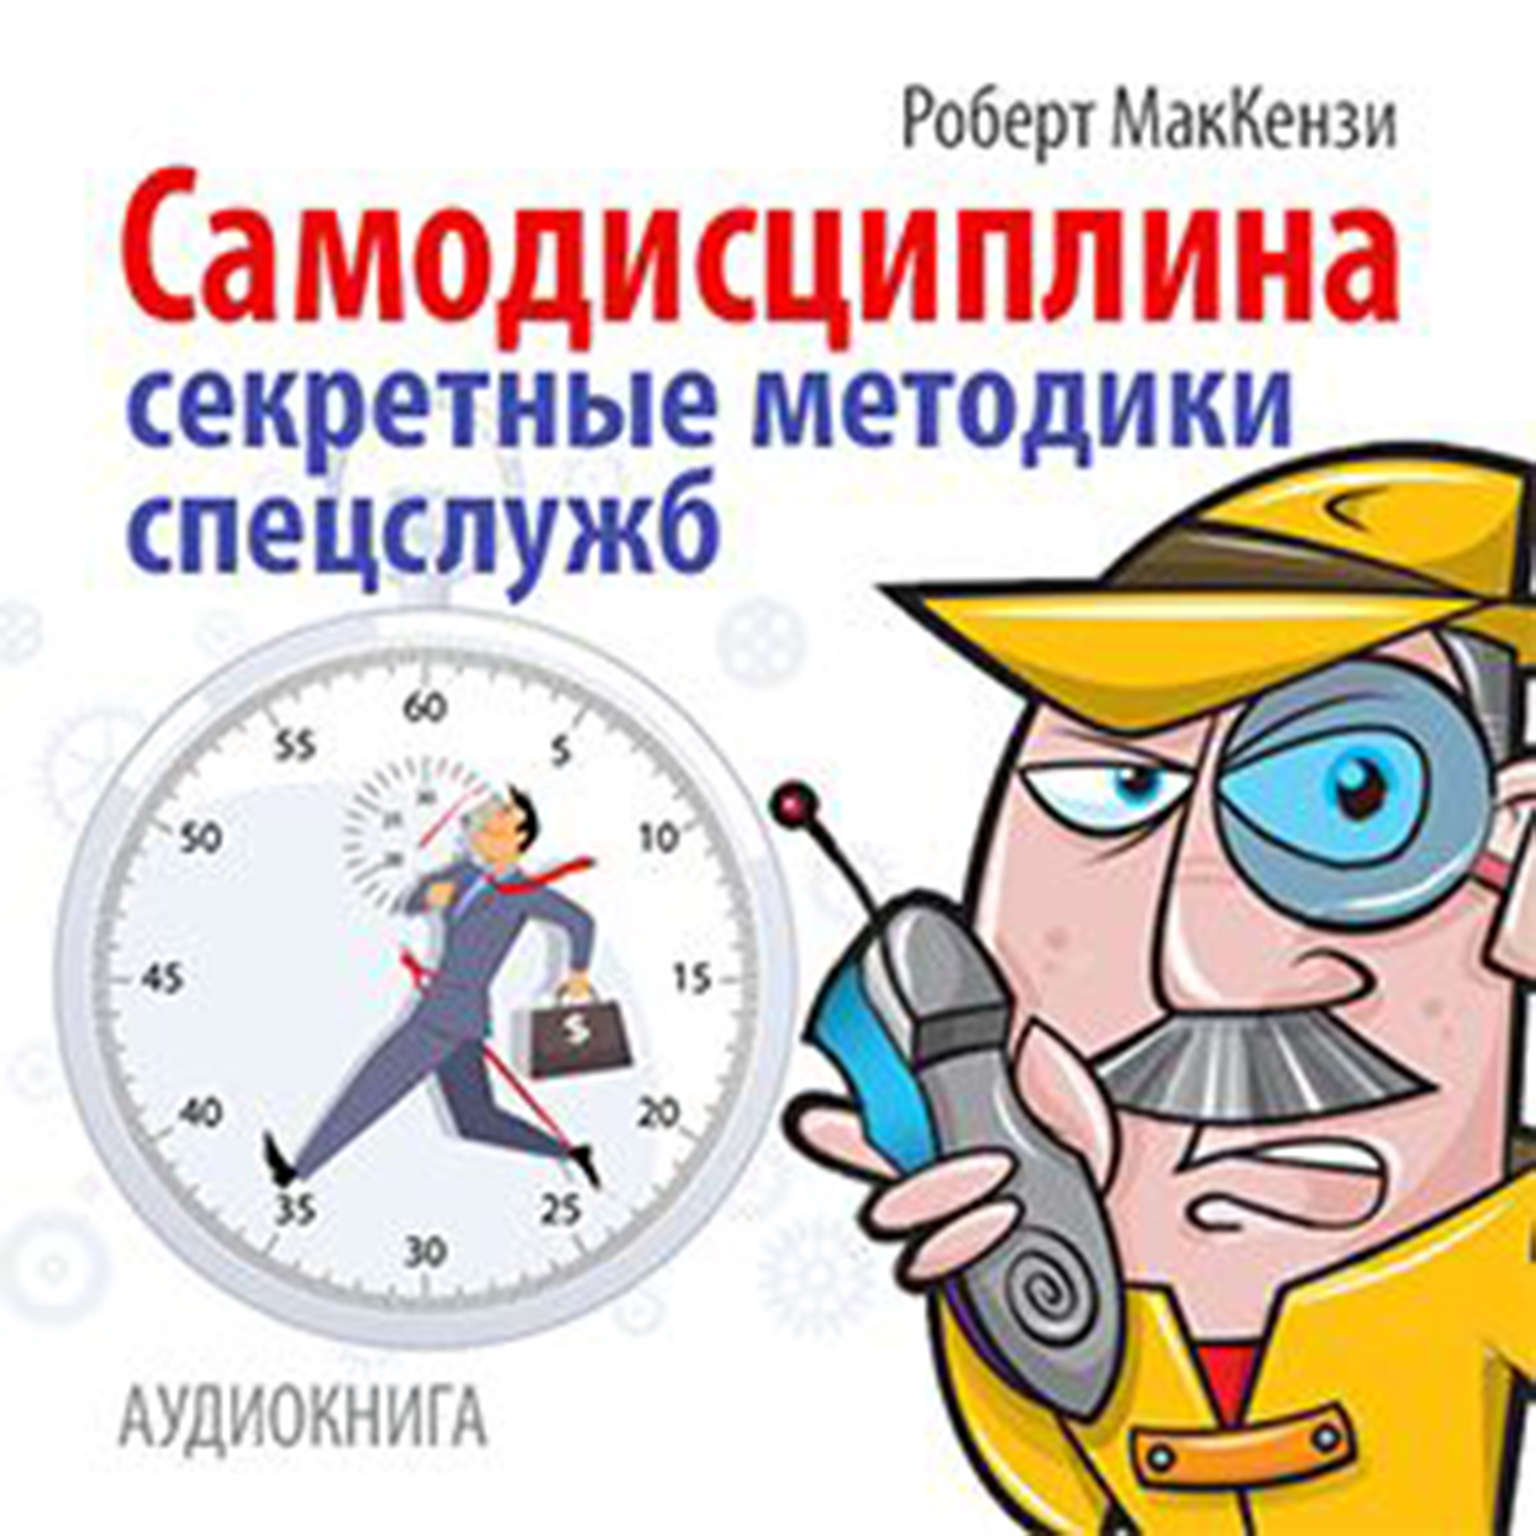 Self-discipline. Secret techniques of special service [Russian Edition] Audiobook, by Robert MakKenzi